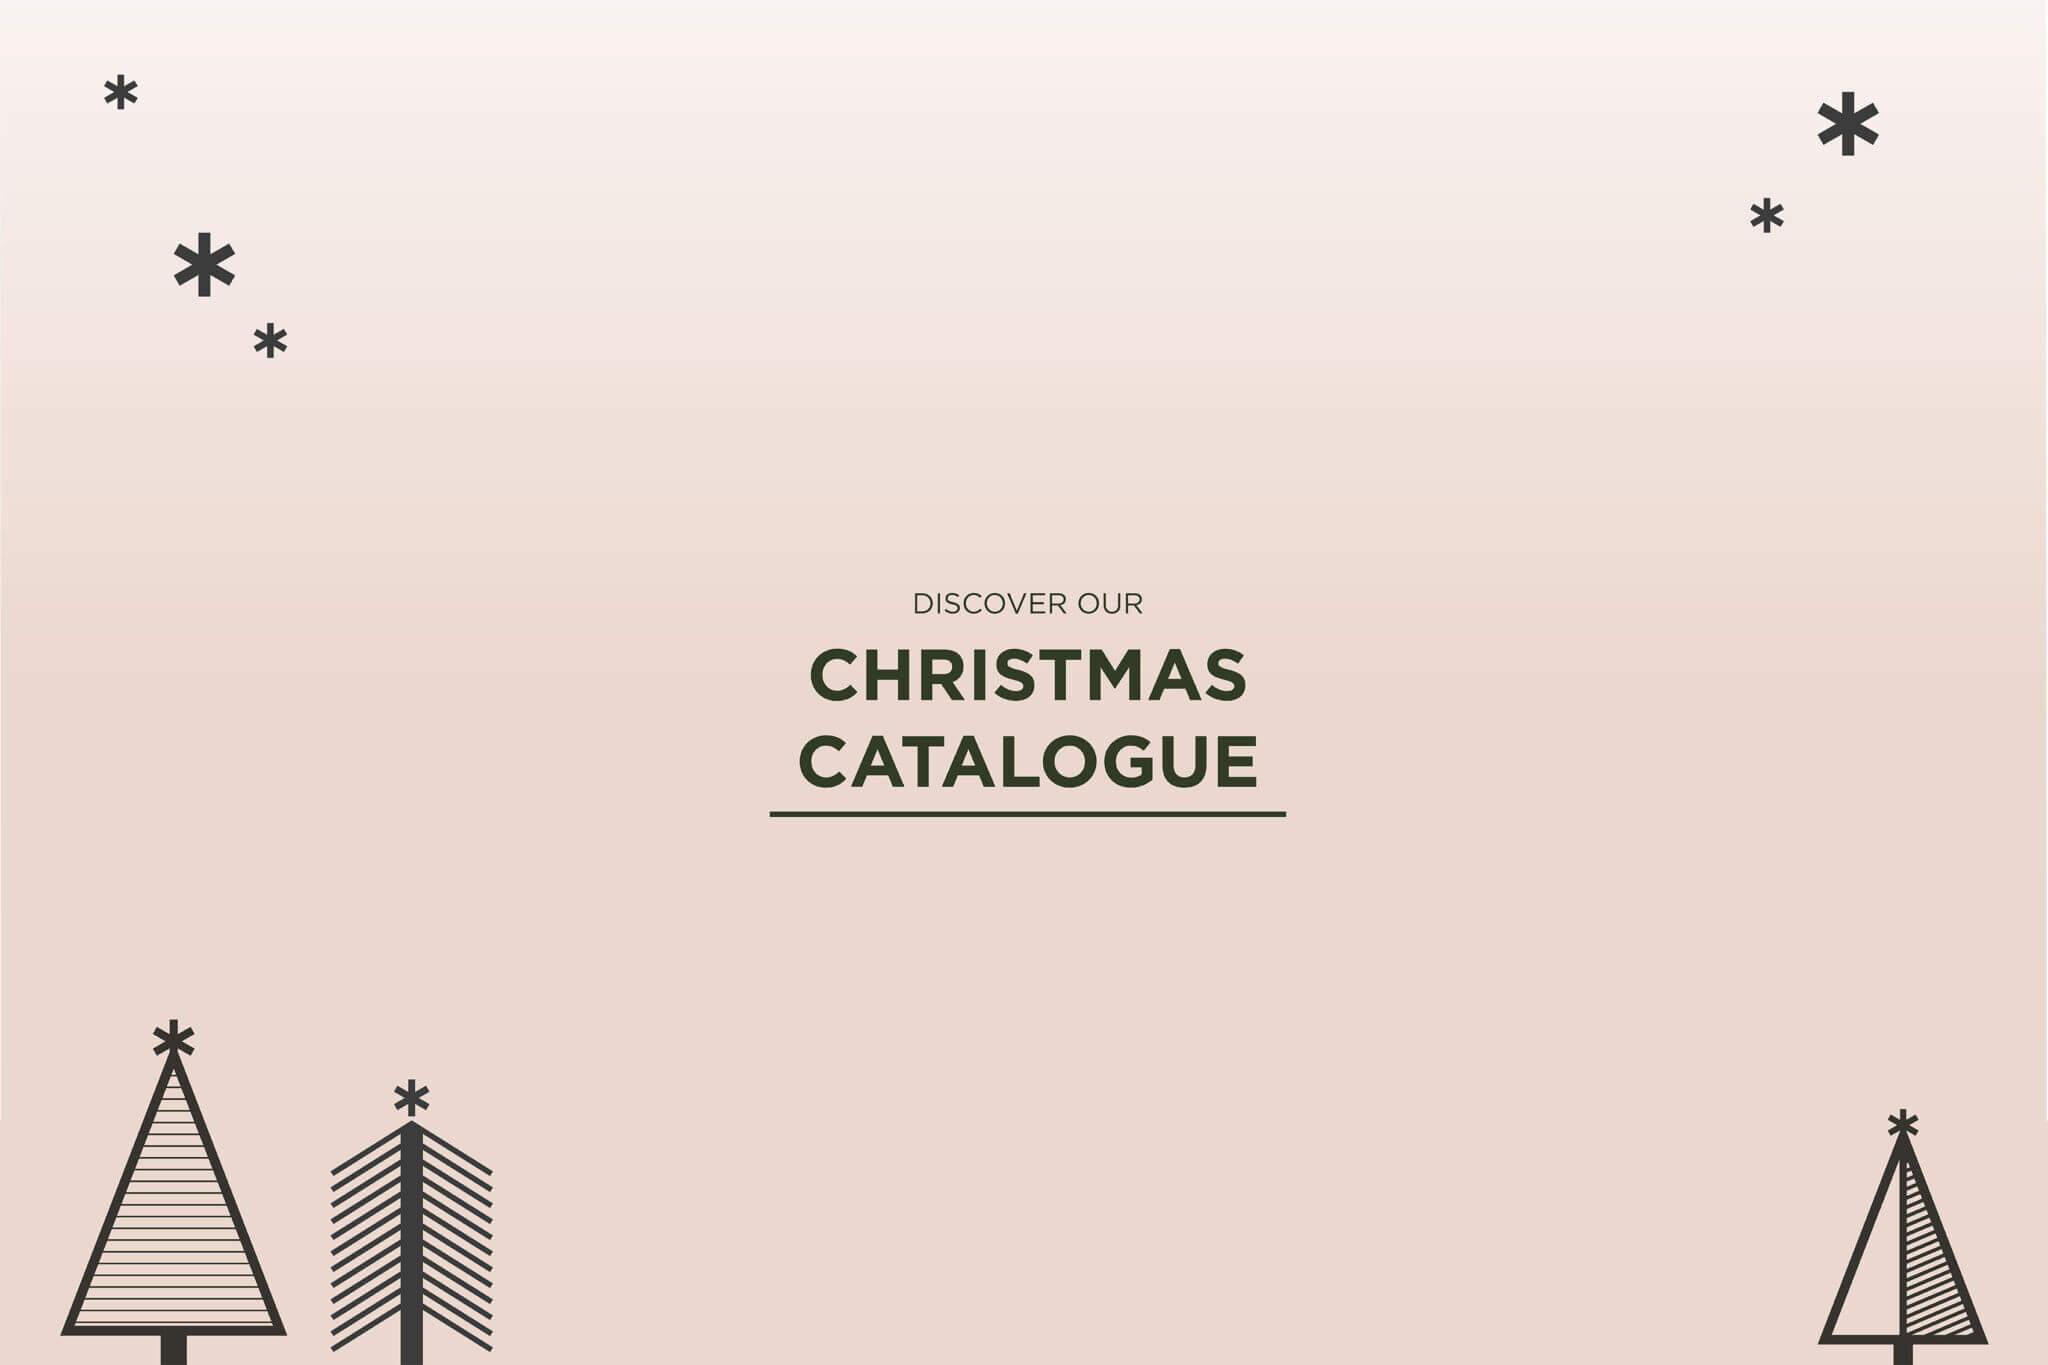 GIR Christmas Catalogue